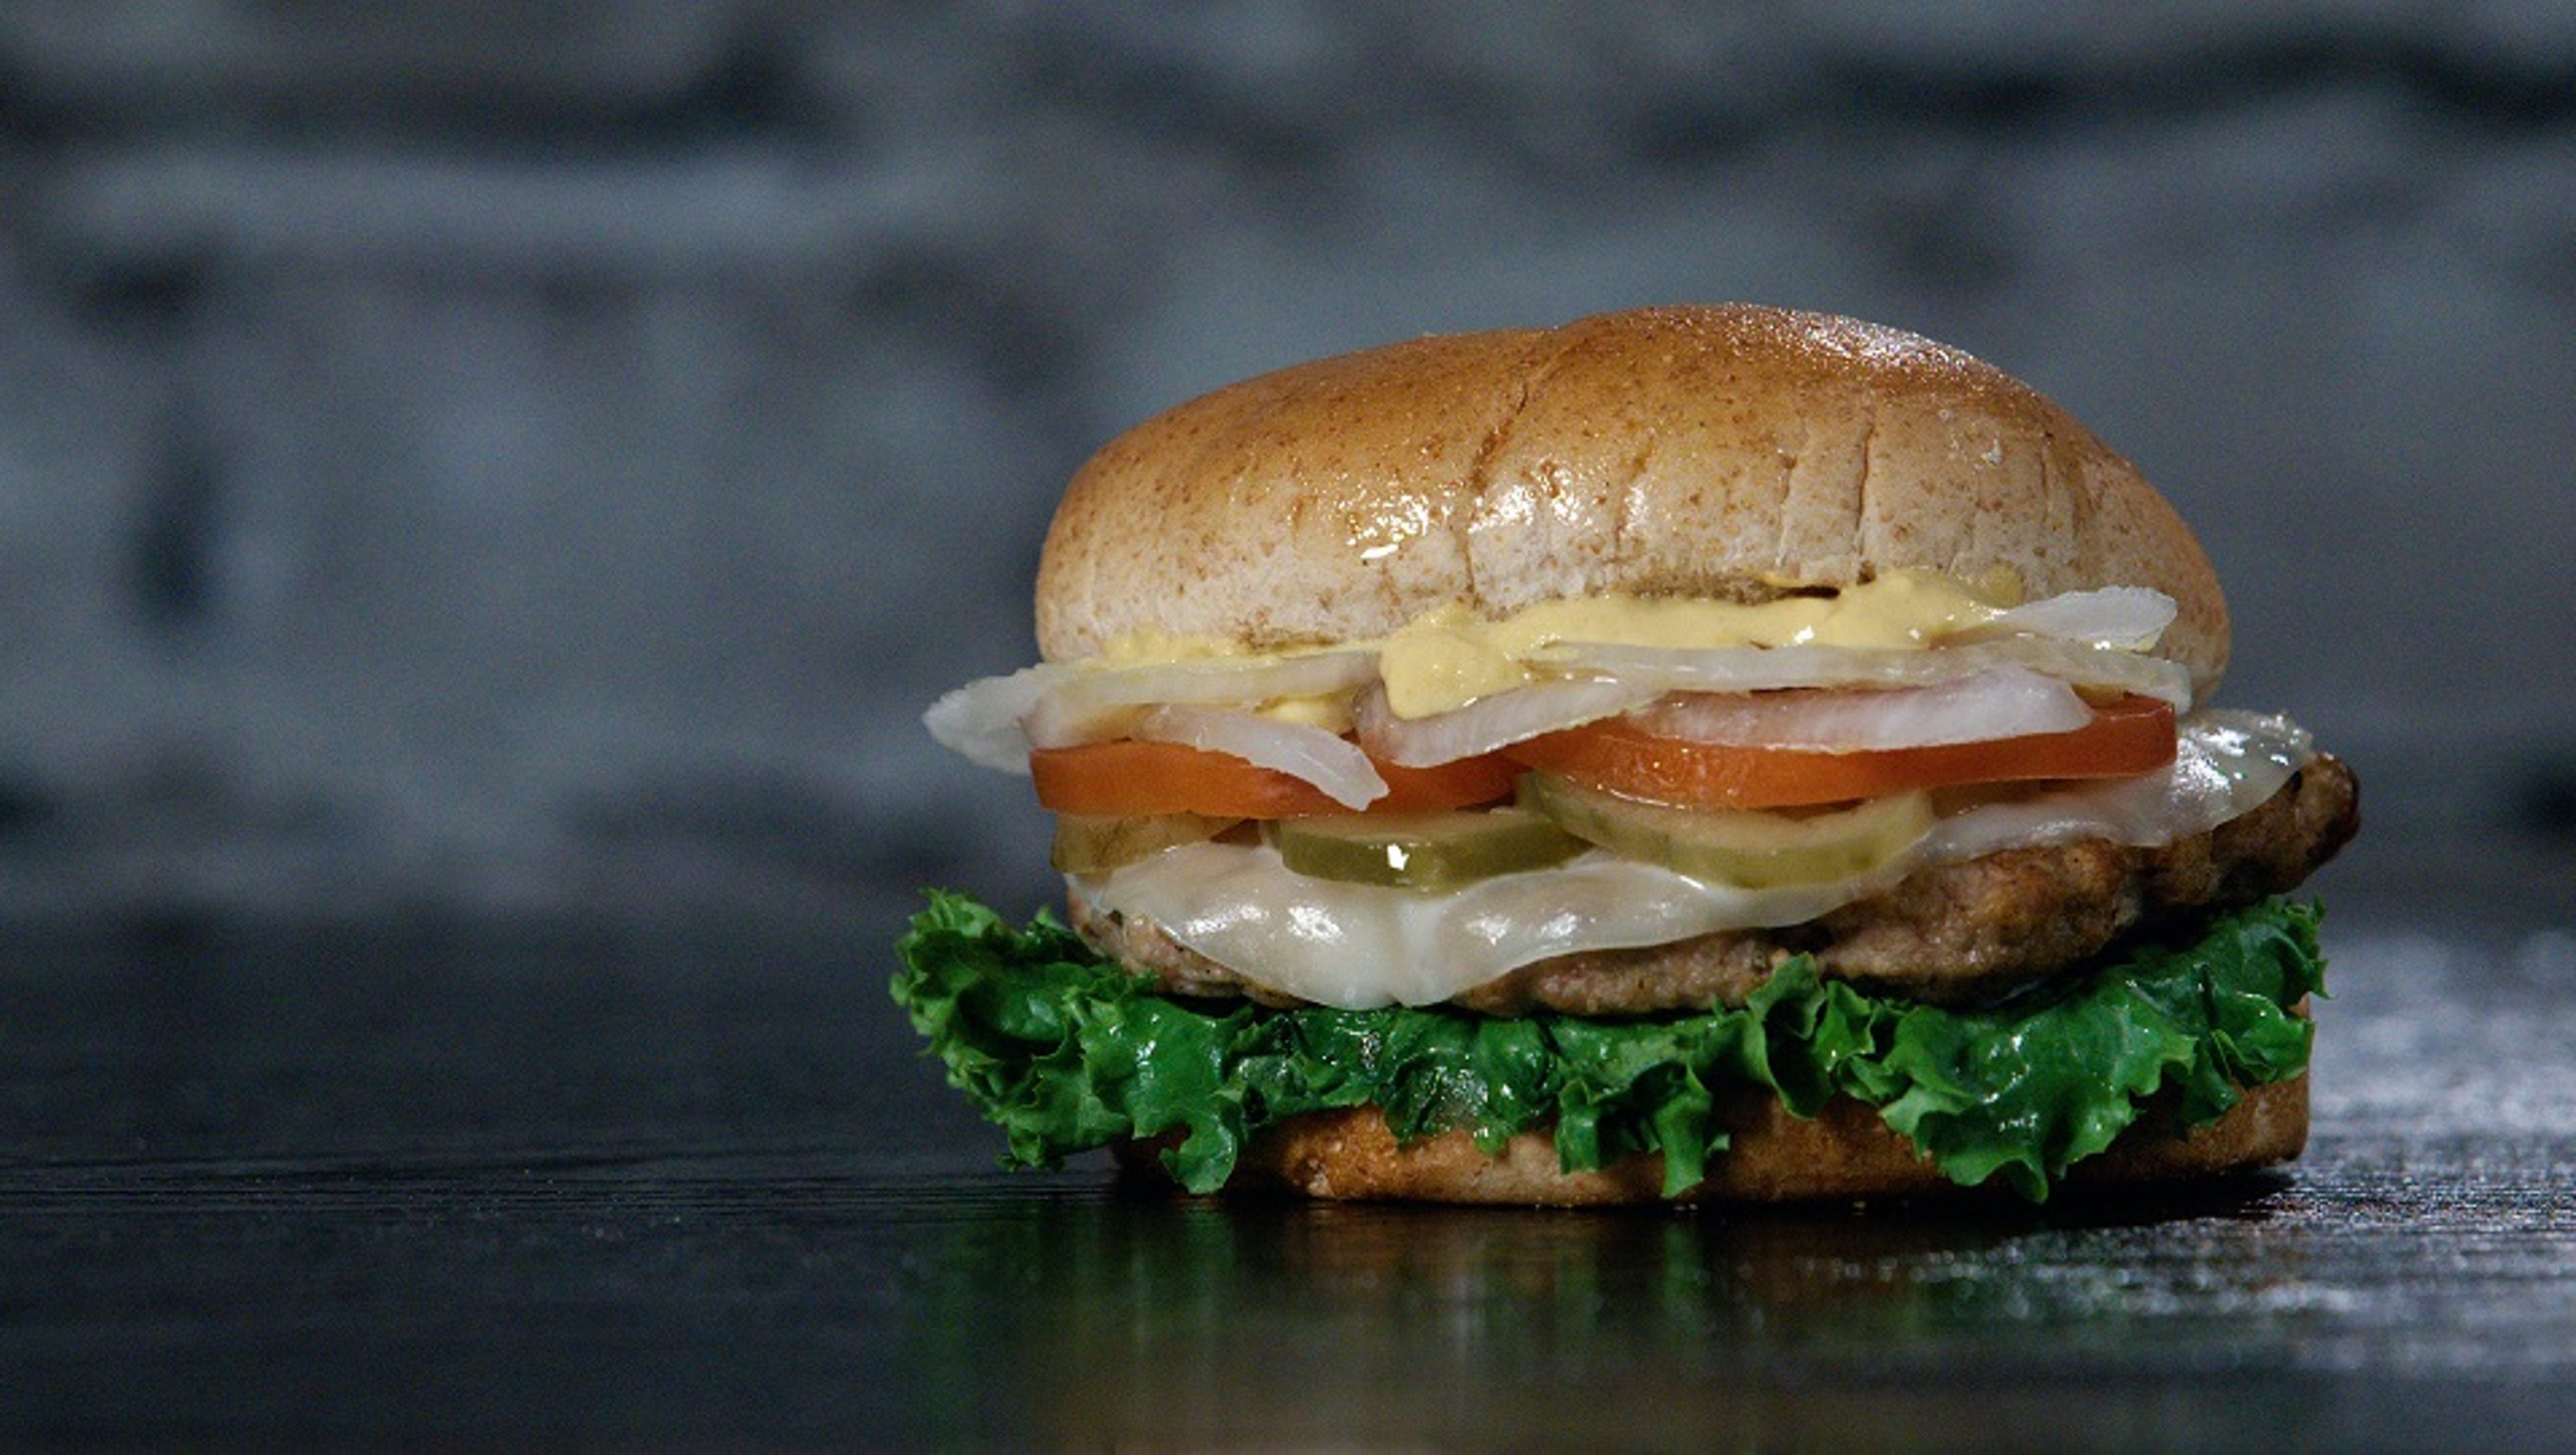 Man Cave Turkey Burgers : Man cave craft eats